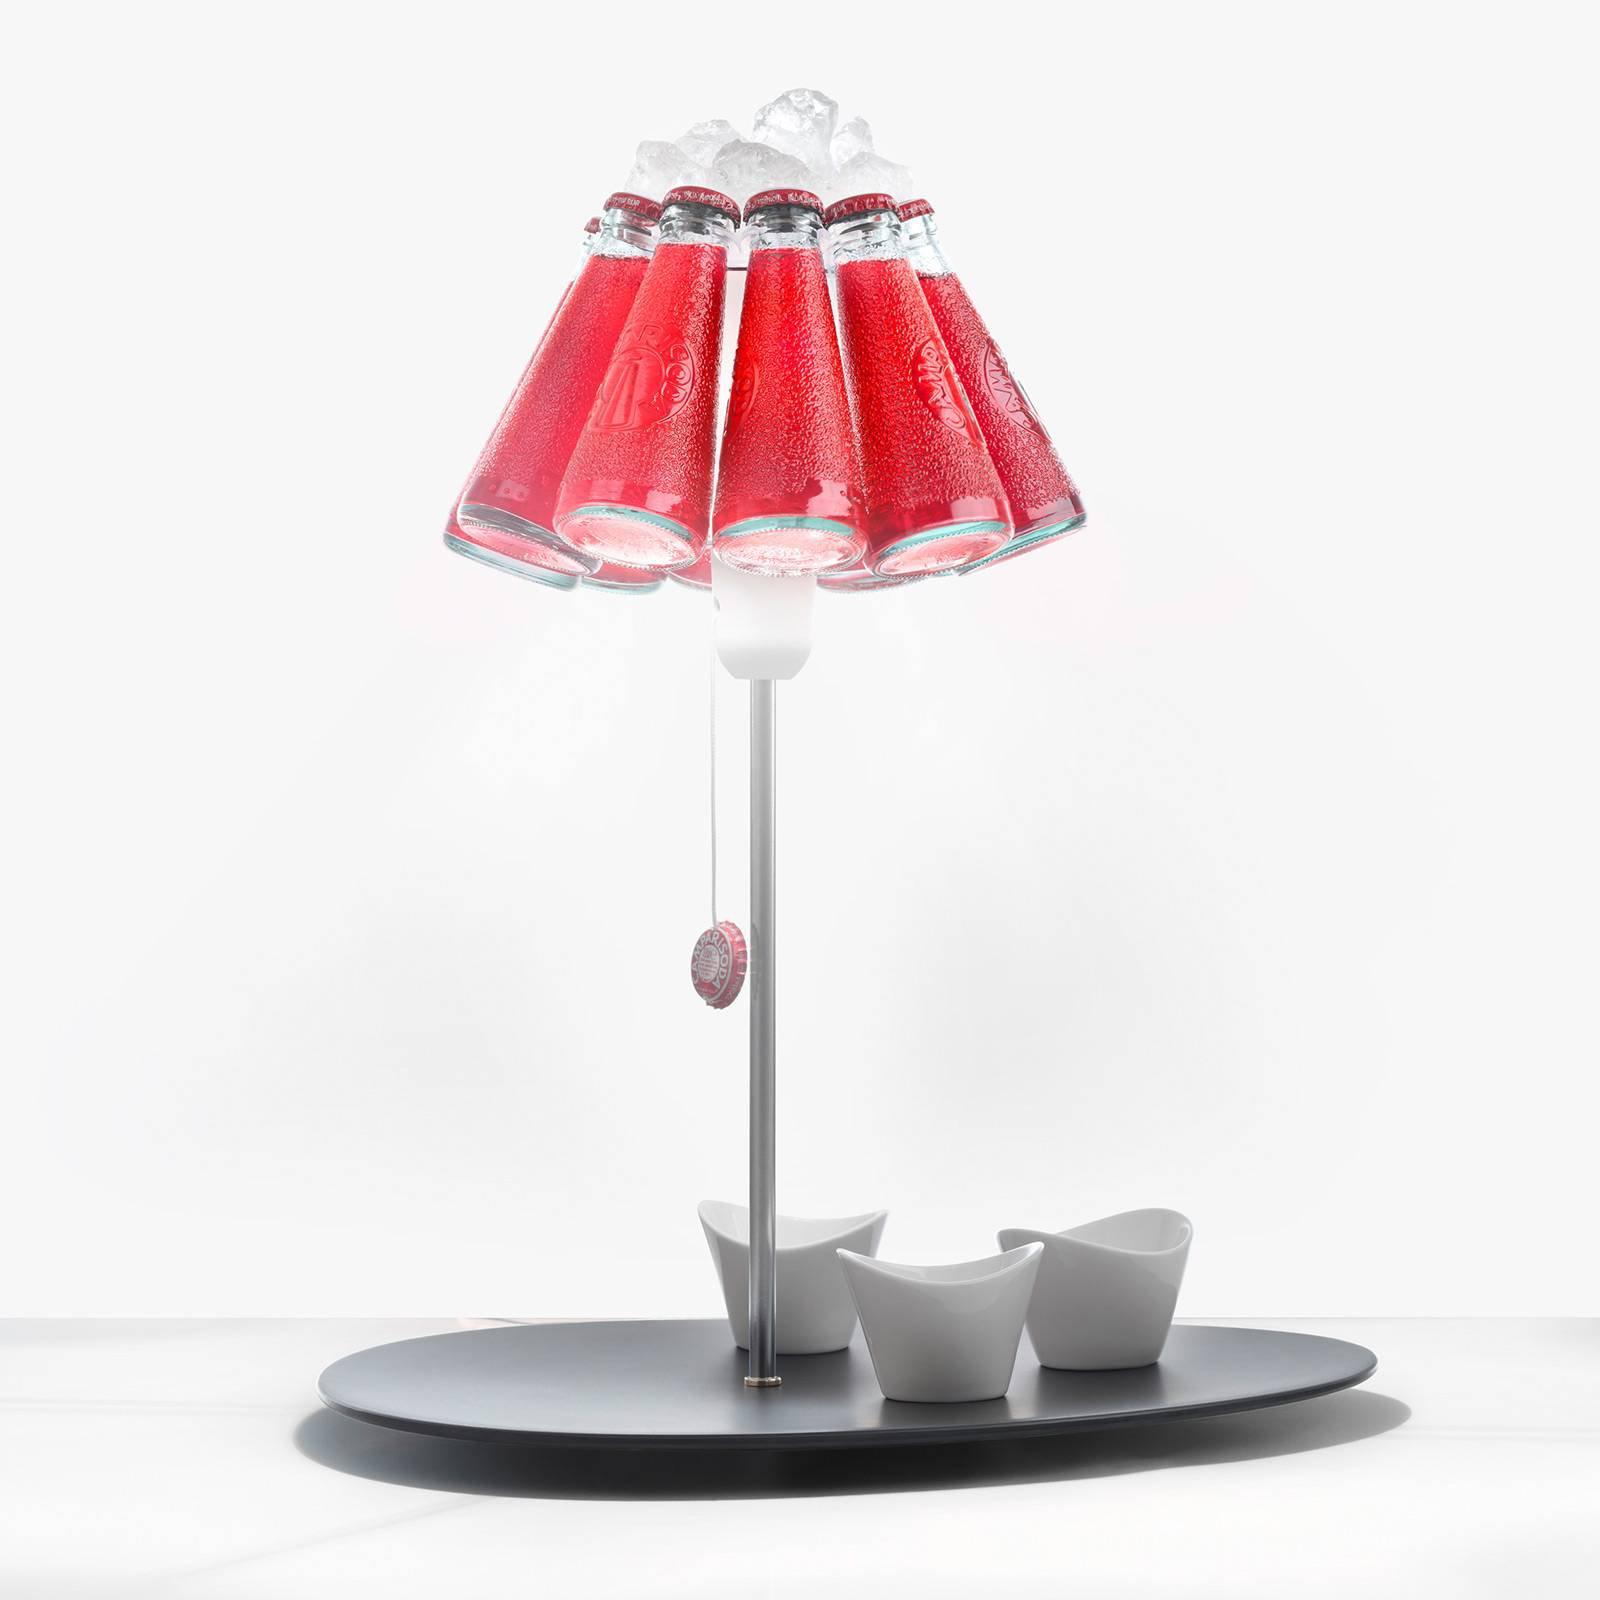 Ingo Maurer Campari Bar bordlampe av flasker